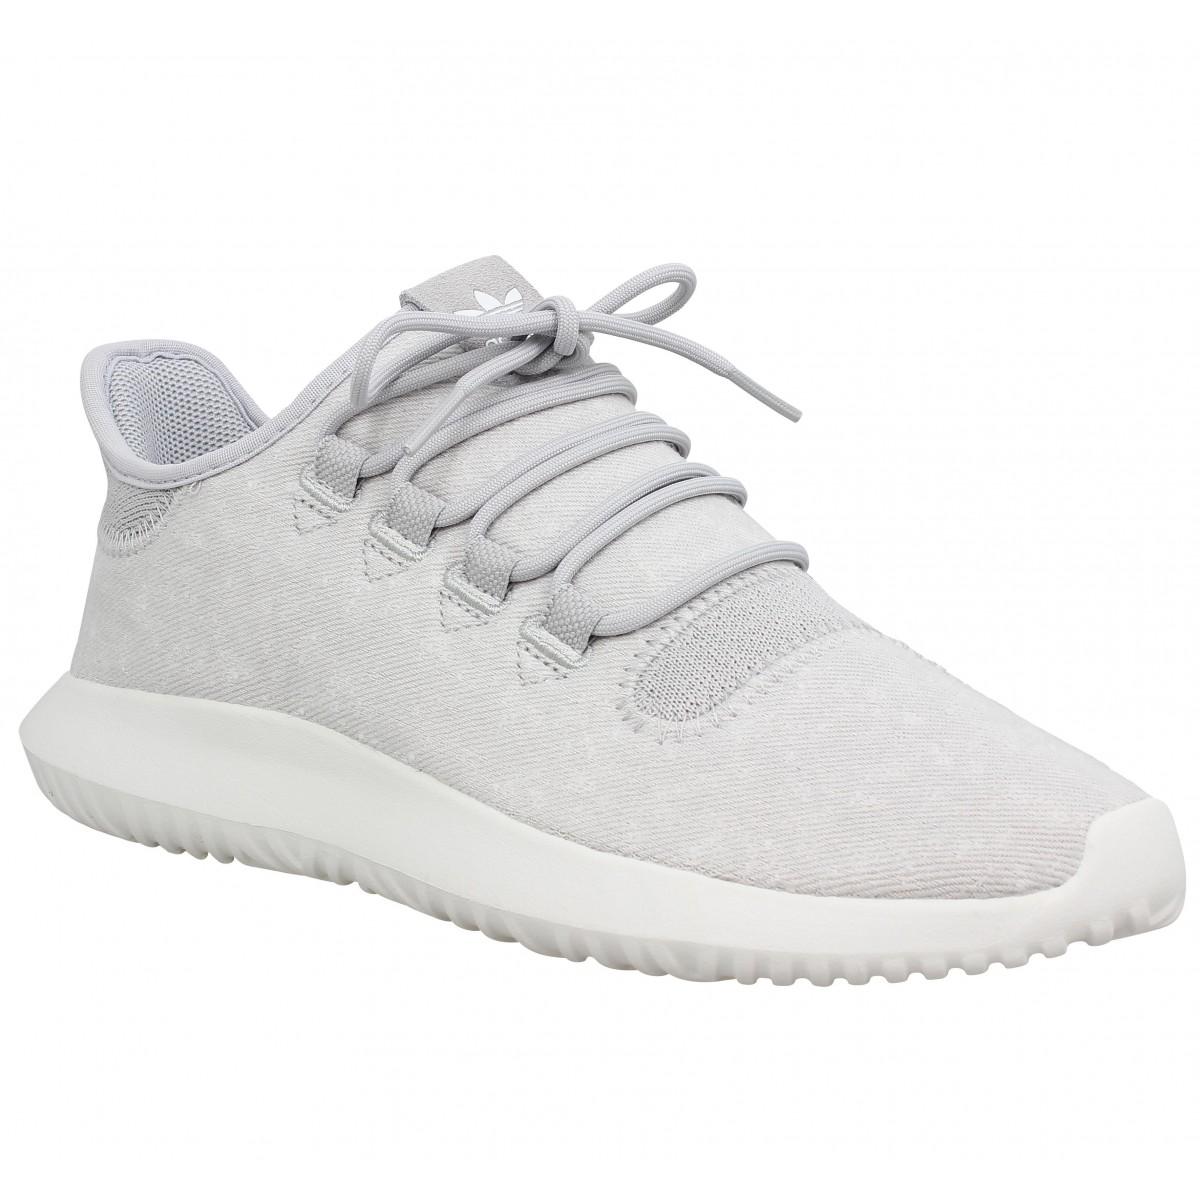 chaussure adidas tissu Cheaper Than Retail Price> Buy Clothing ...